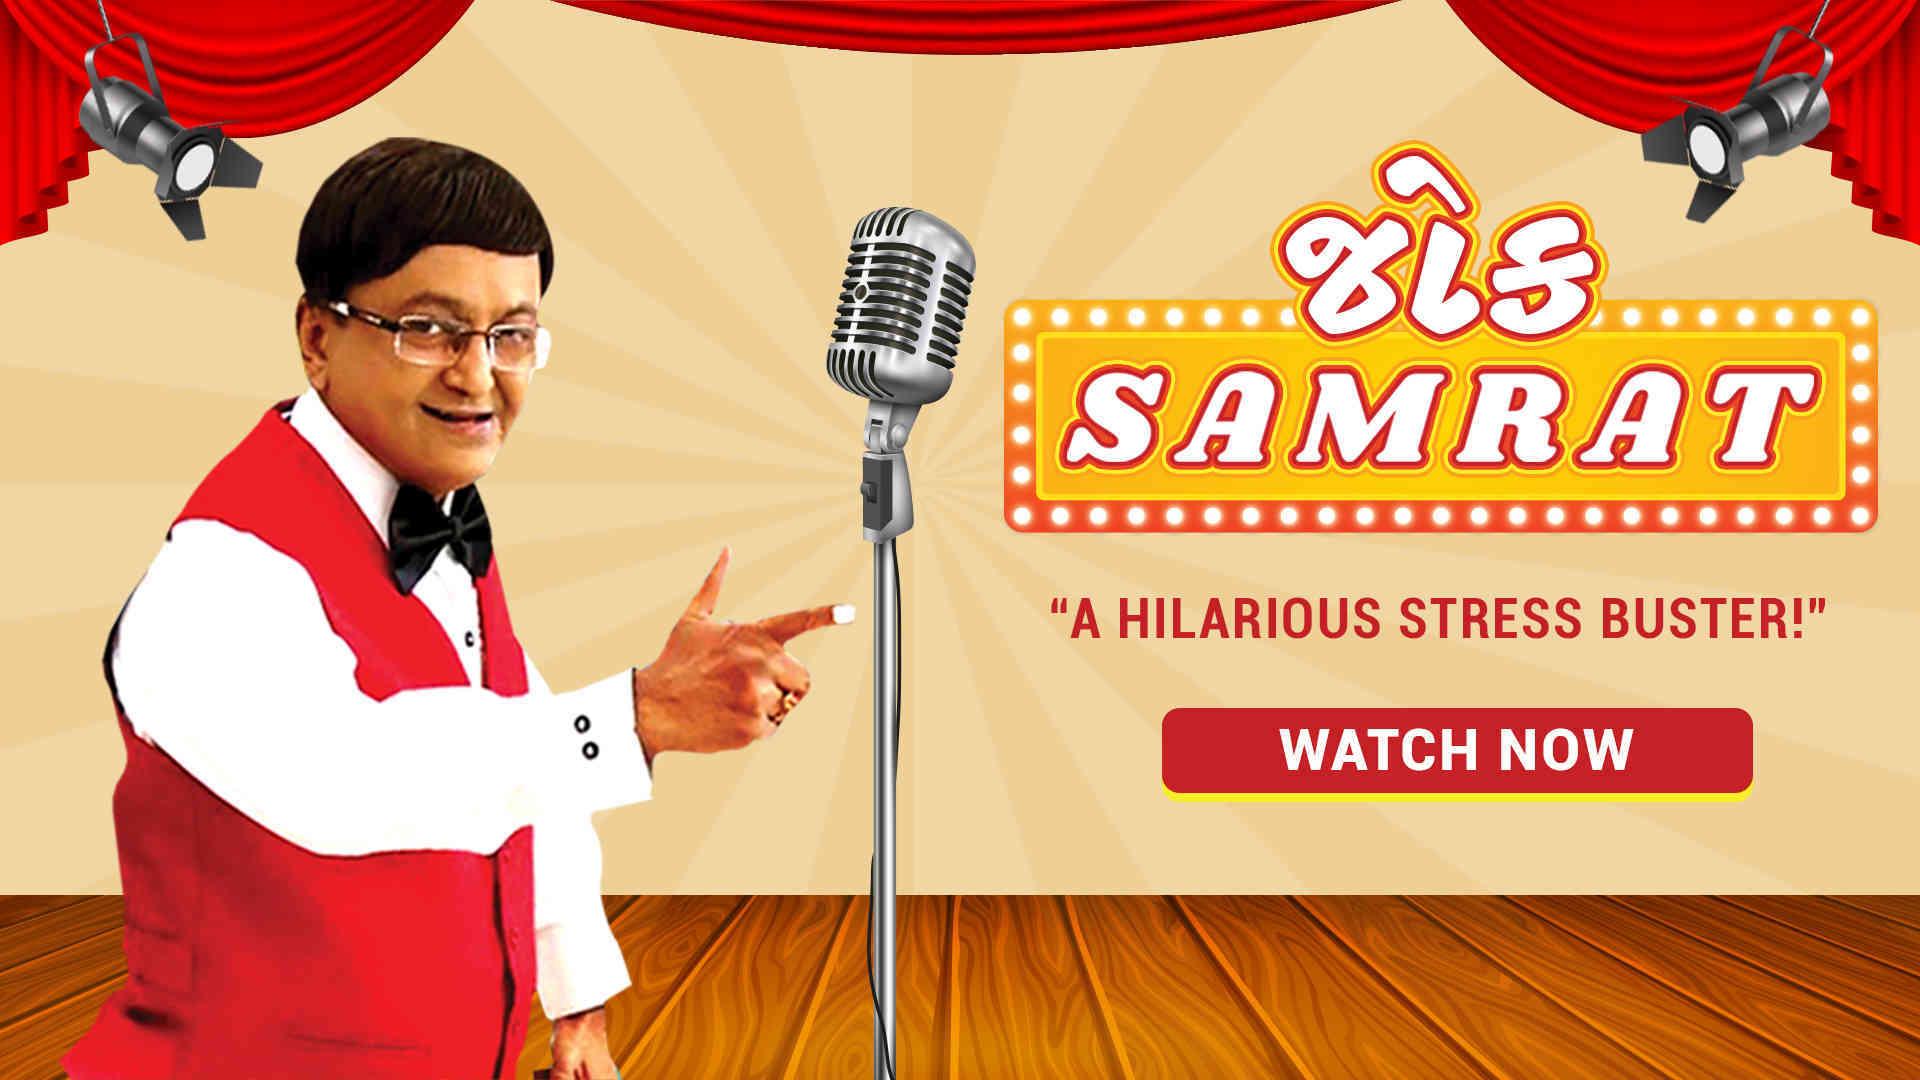 Joke Samrat